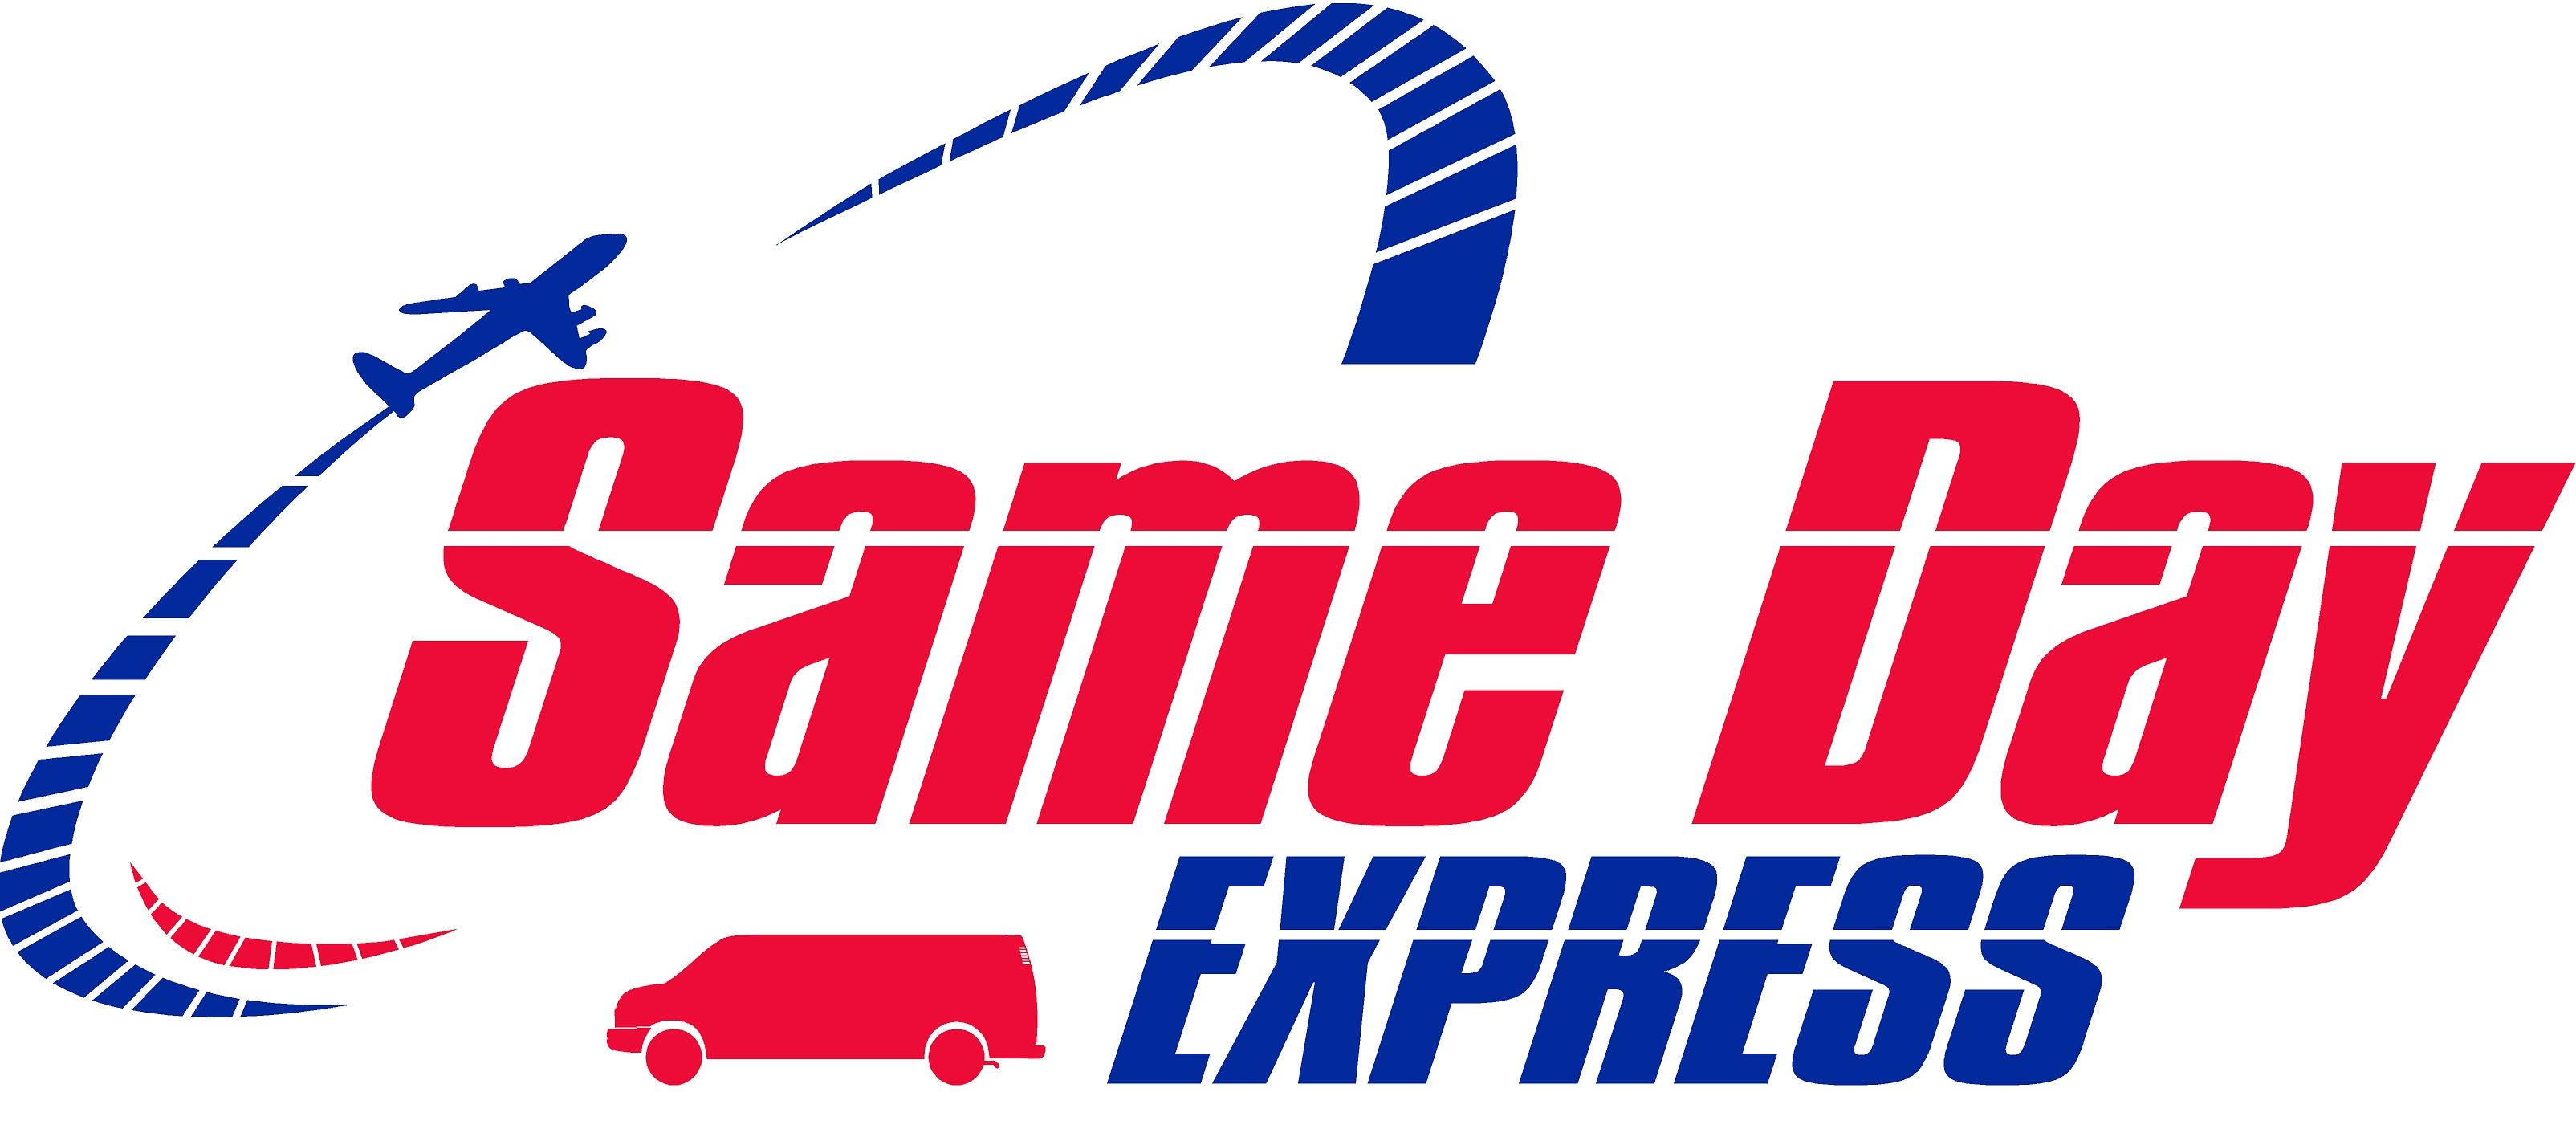 Sameday Express